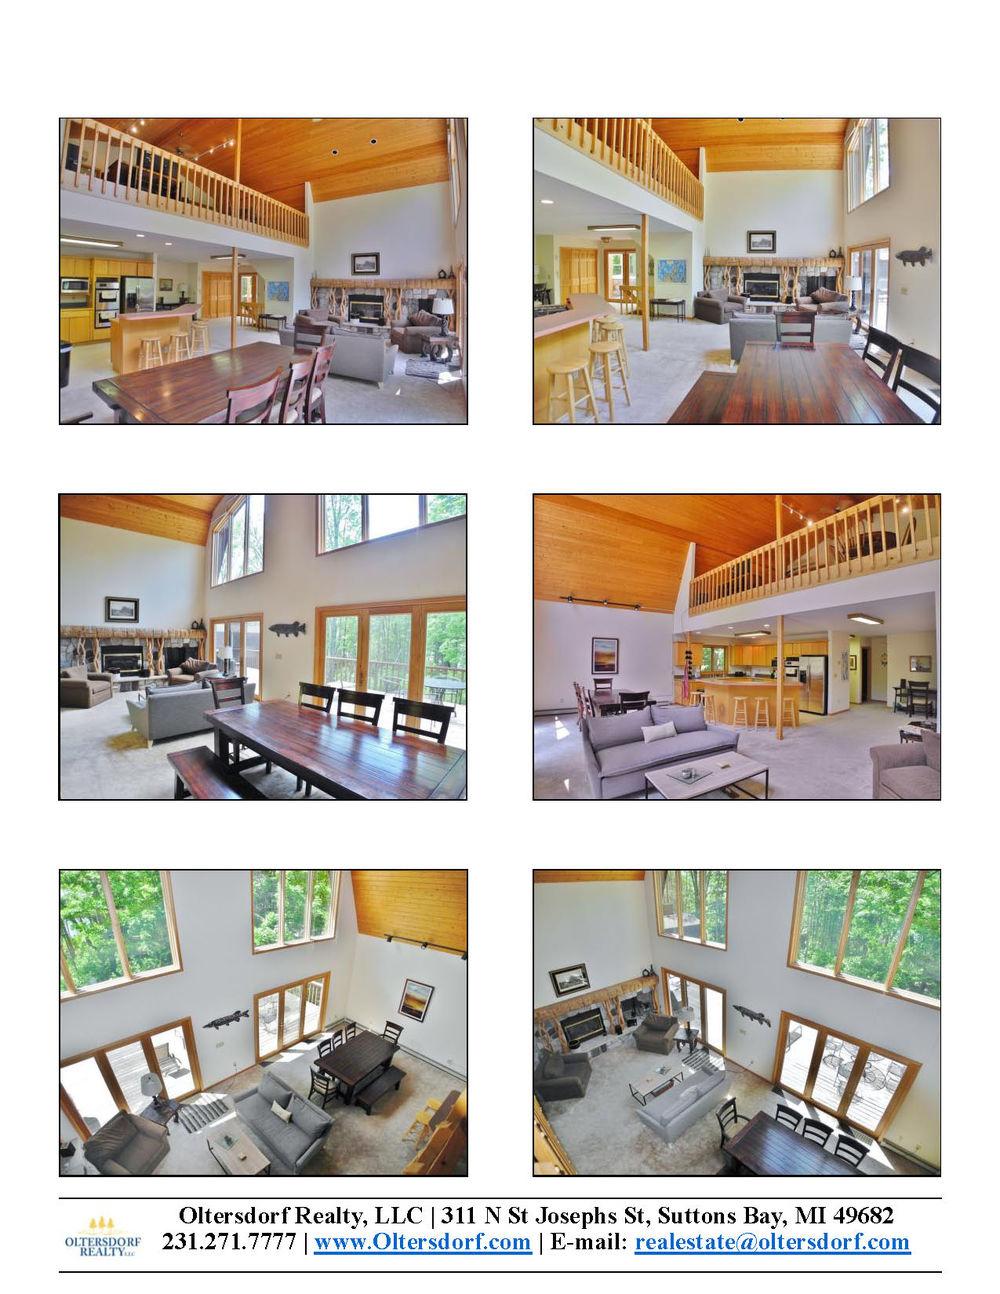 2736 S Lake Leelanau Dr, South Lake Leelanau Waterfront for sale by Oltersdorf Realty LLC - Marketing Packet (4).jpg